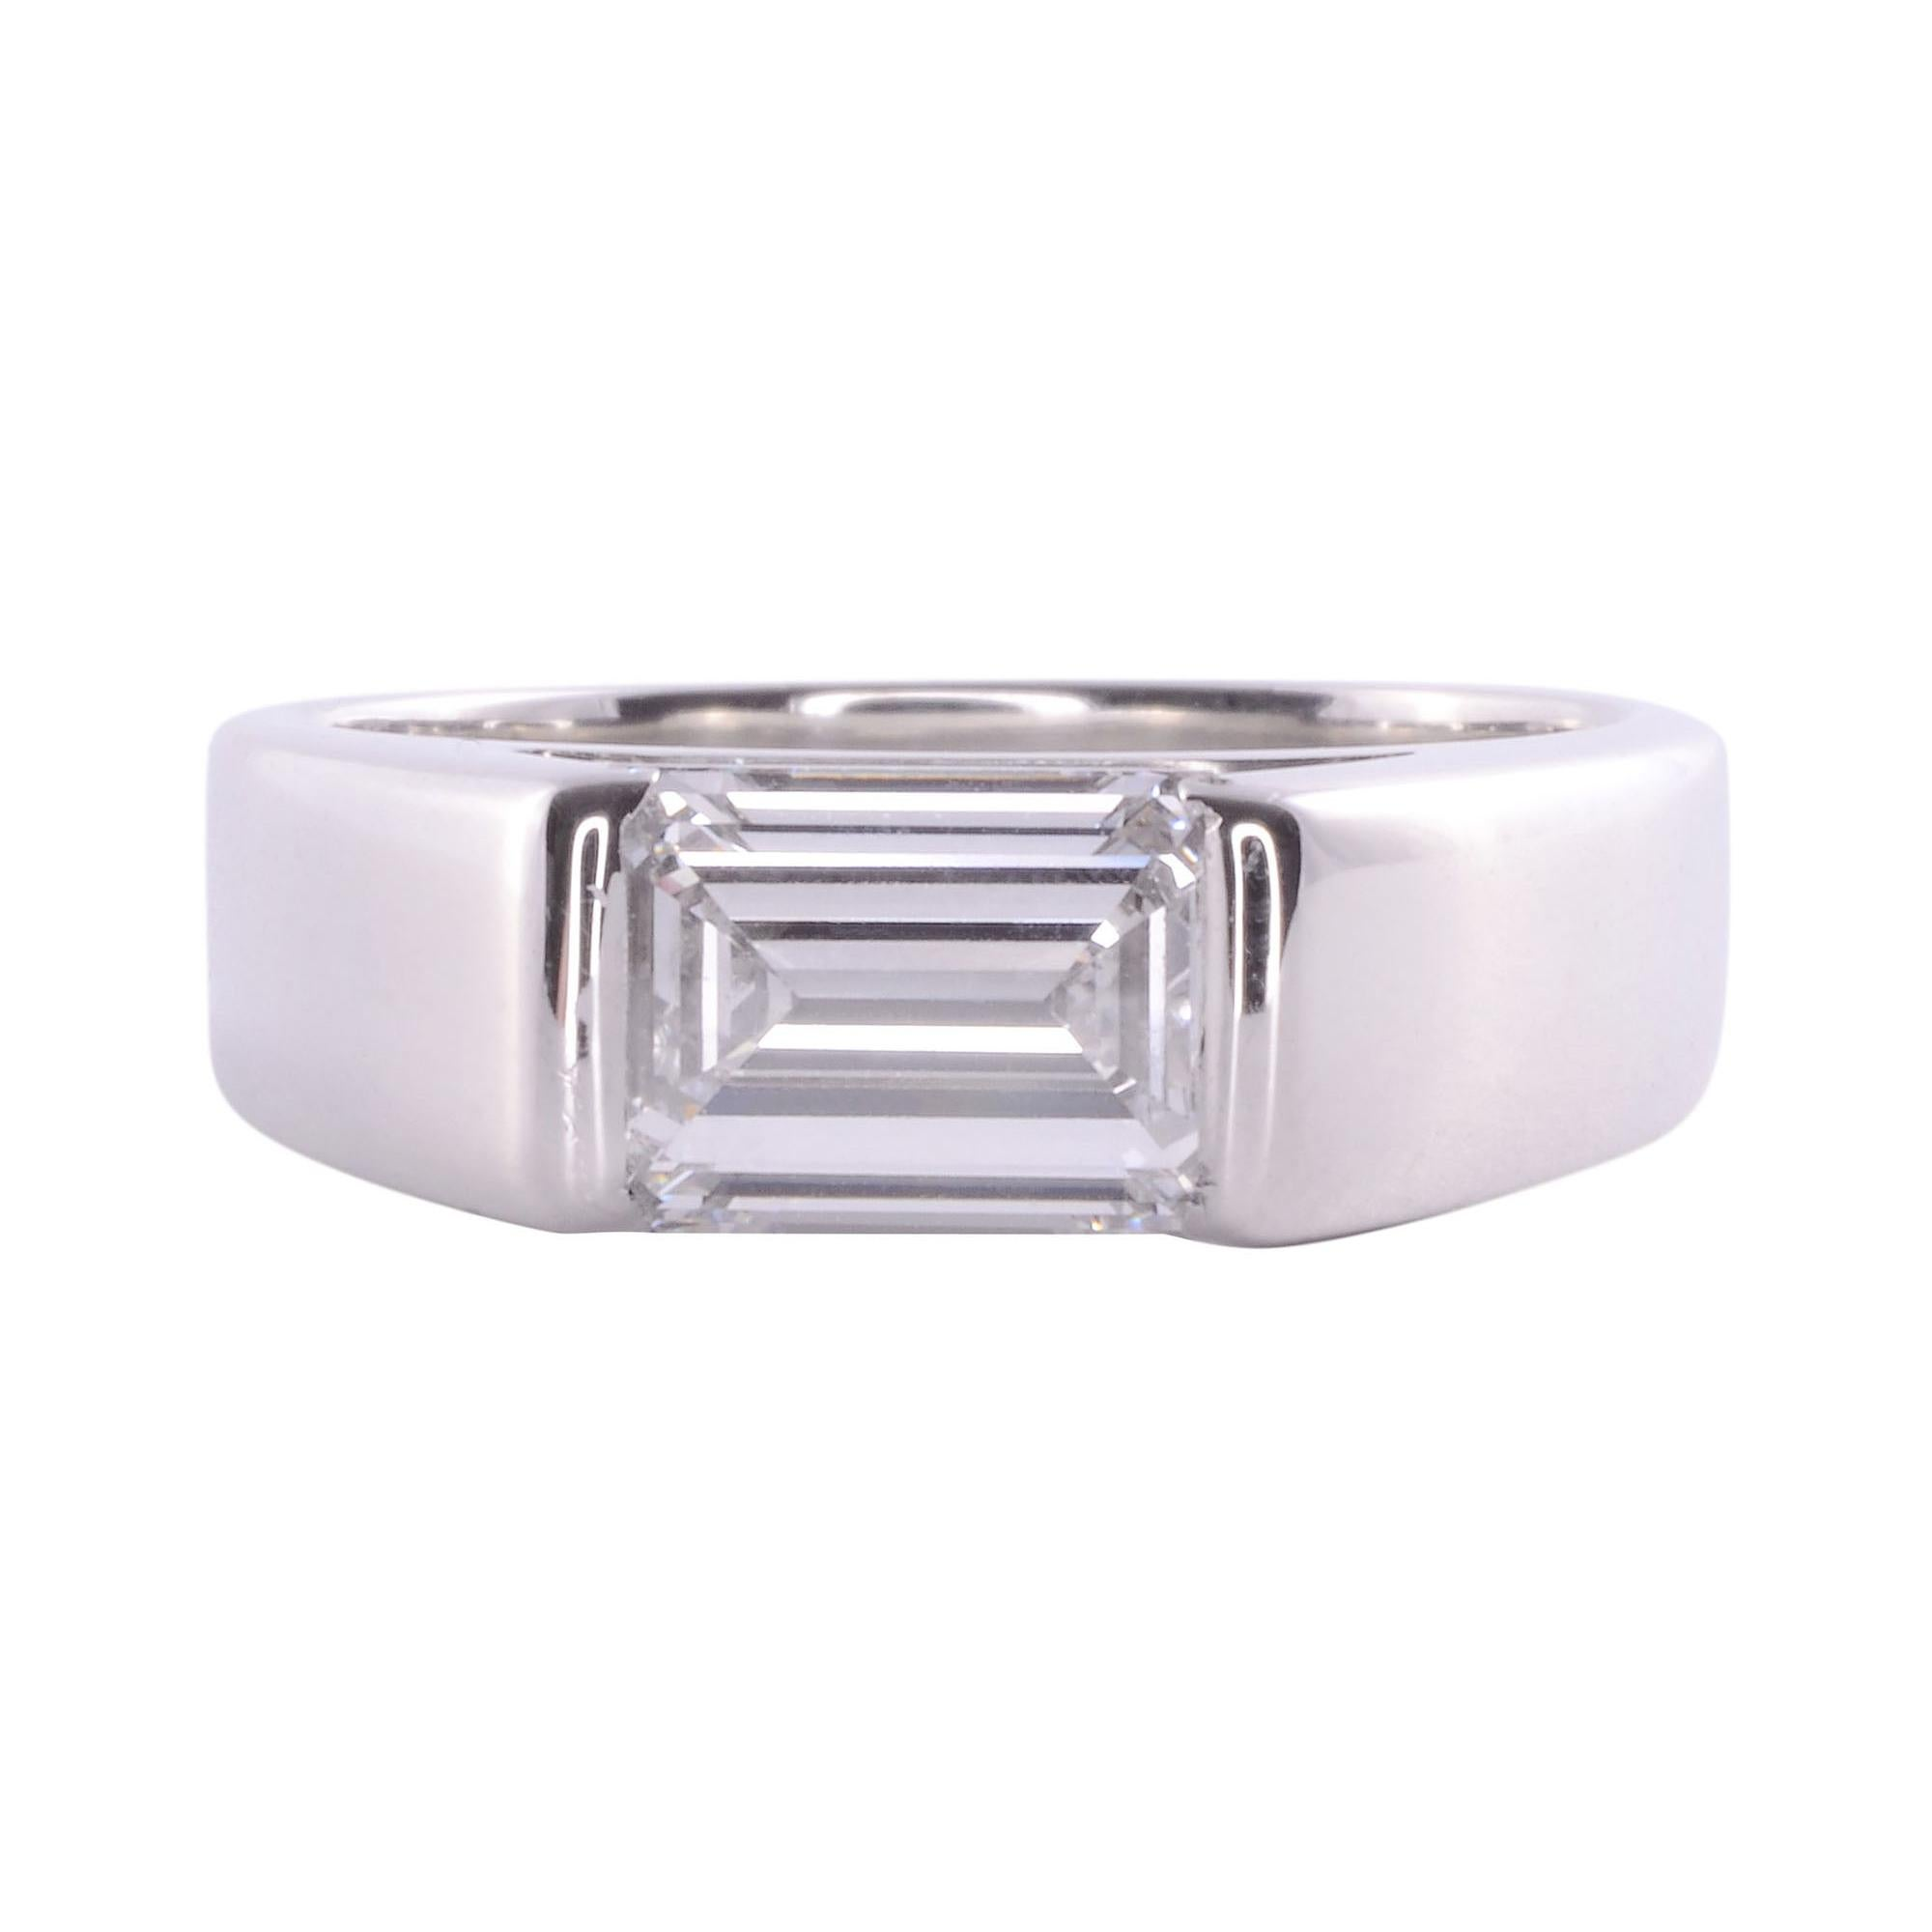 1.73 Carat VVS2 Emerald Cut Diamond Platinum Ring